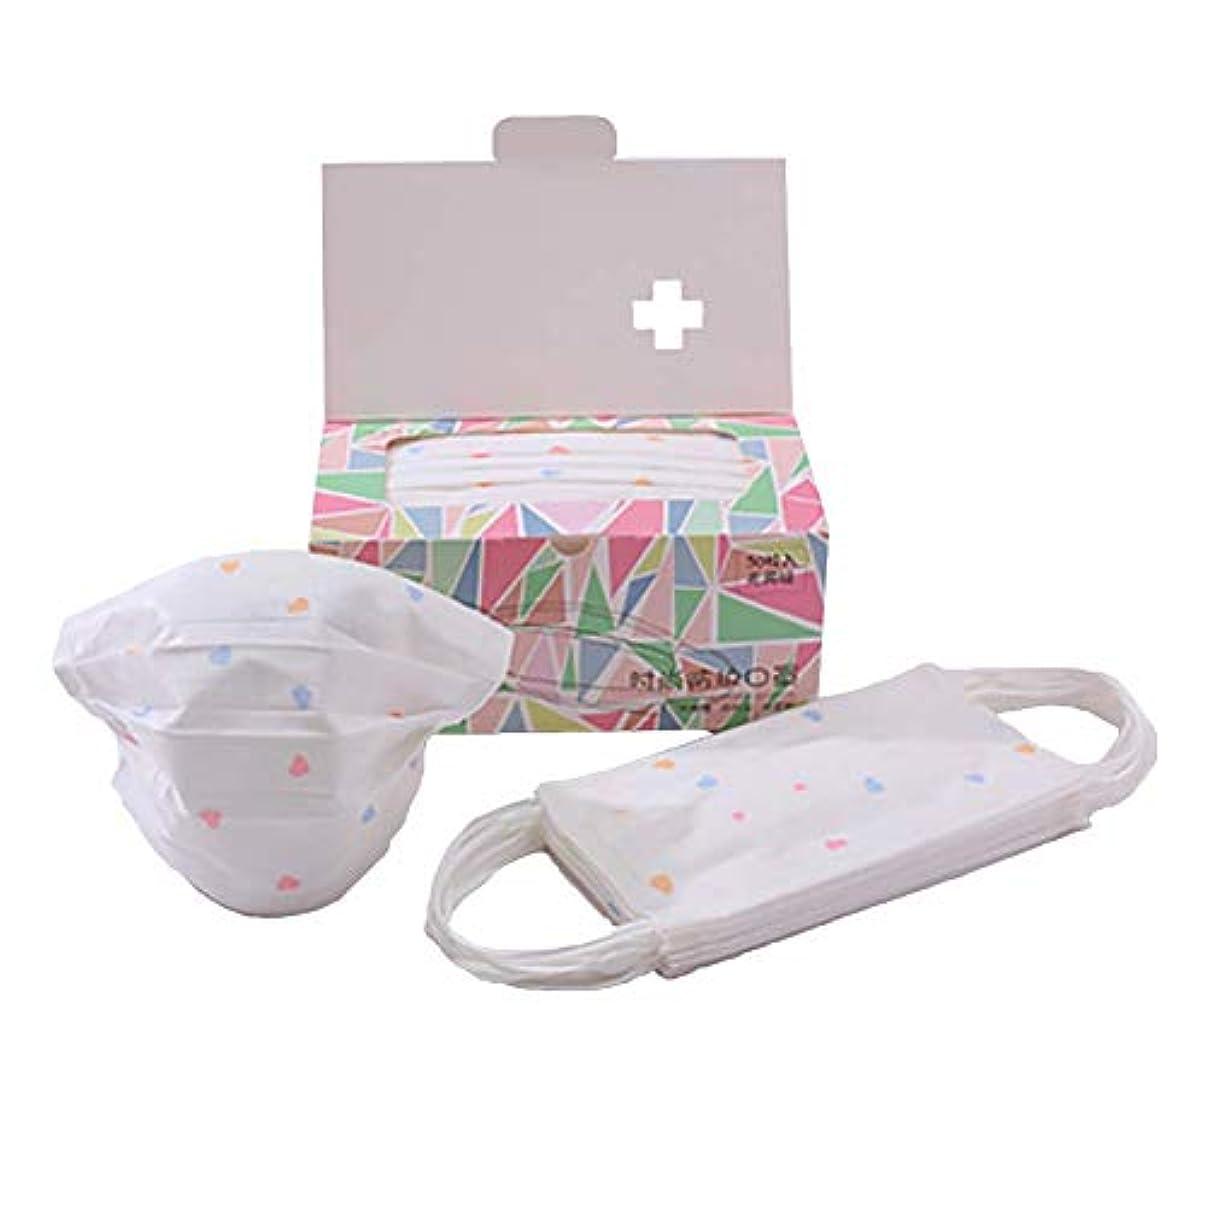 Chinashow 100個使い捨てイヤループフェイスマスク - 歯科手術用医療アレルギーインフルエンザ低刺激性、通気性 生殖防塵マスク白 愛